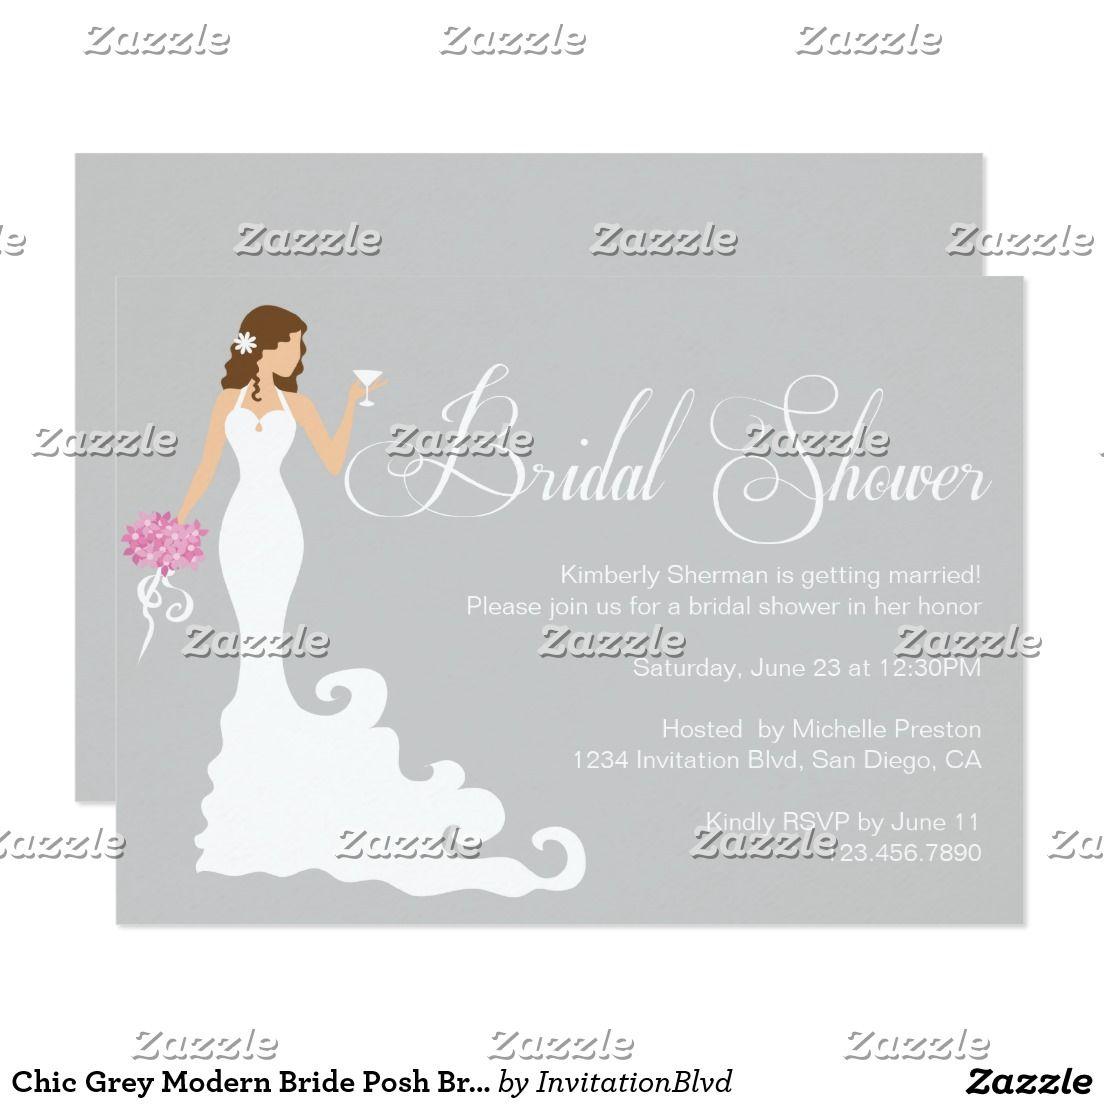 Chic Grey Modern Bride Posh Bridal Shower Invite